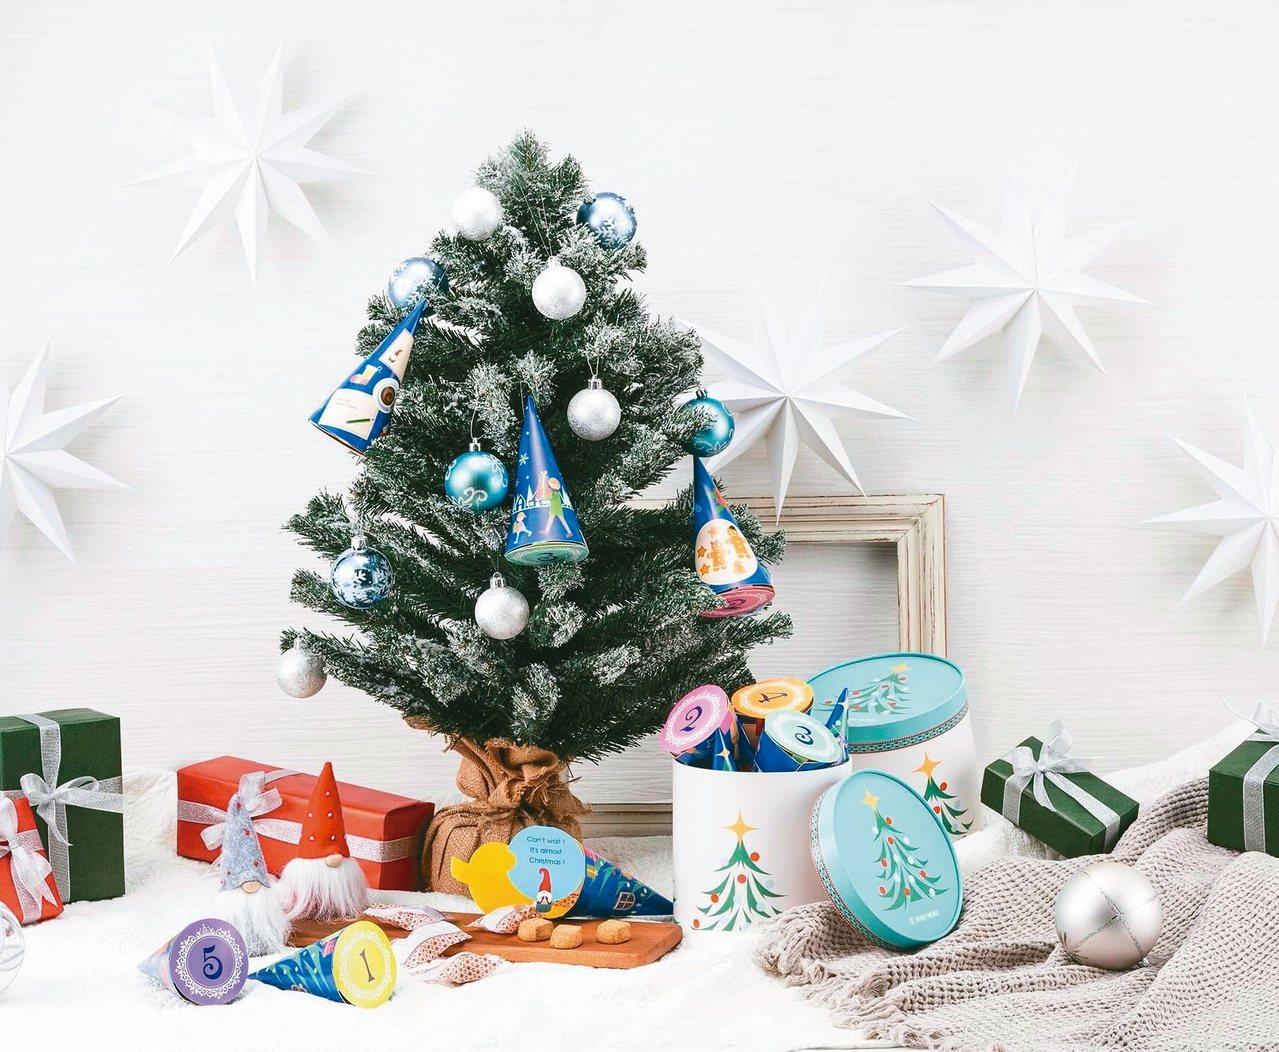 YOKU MOKU首度推出甜筒造型的耶誕倒數禮盒。 圖/YOKU MOKU提供